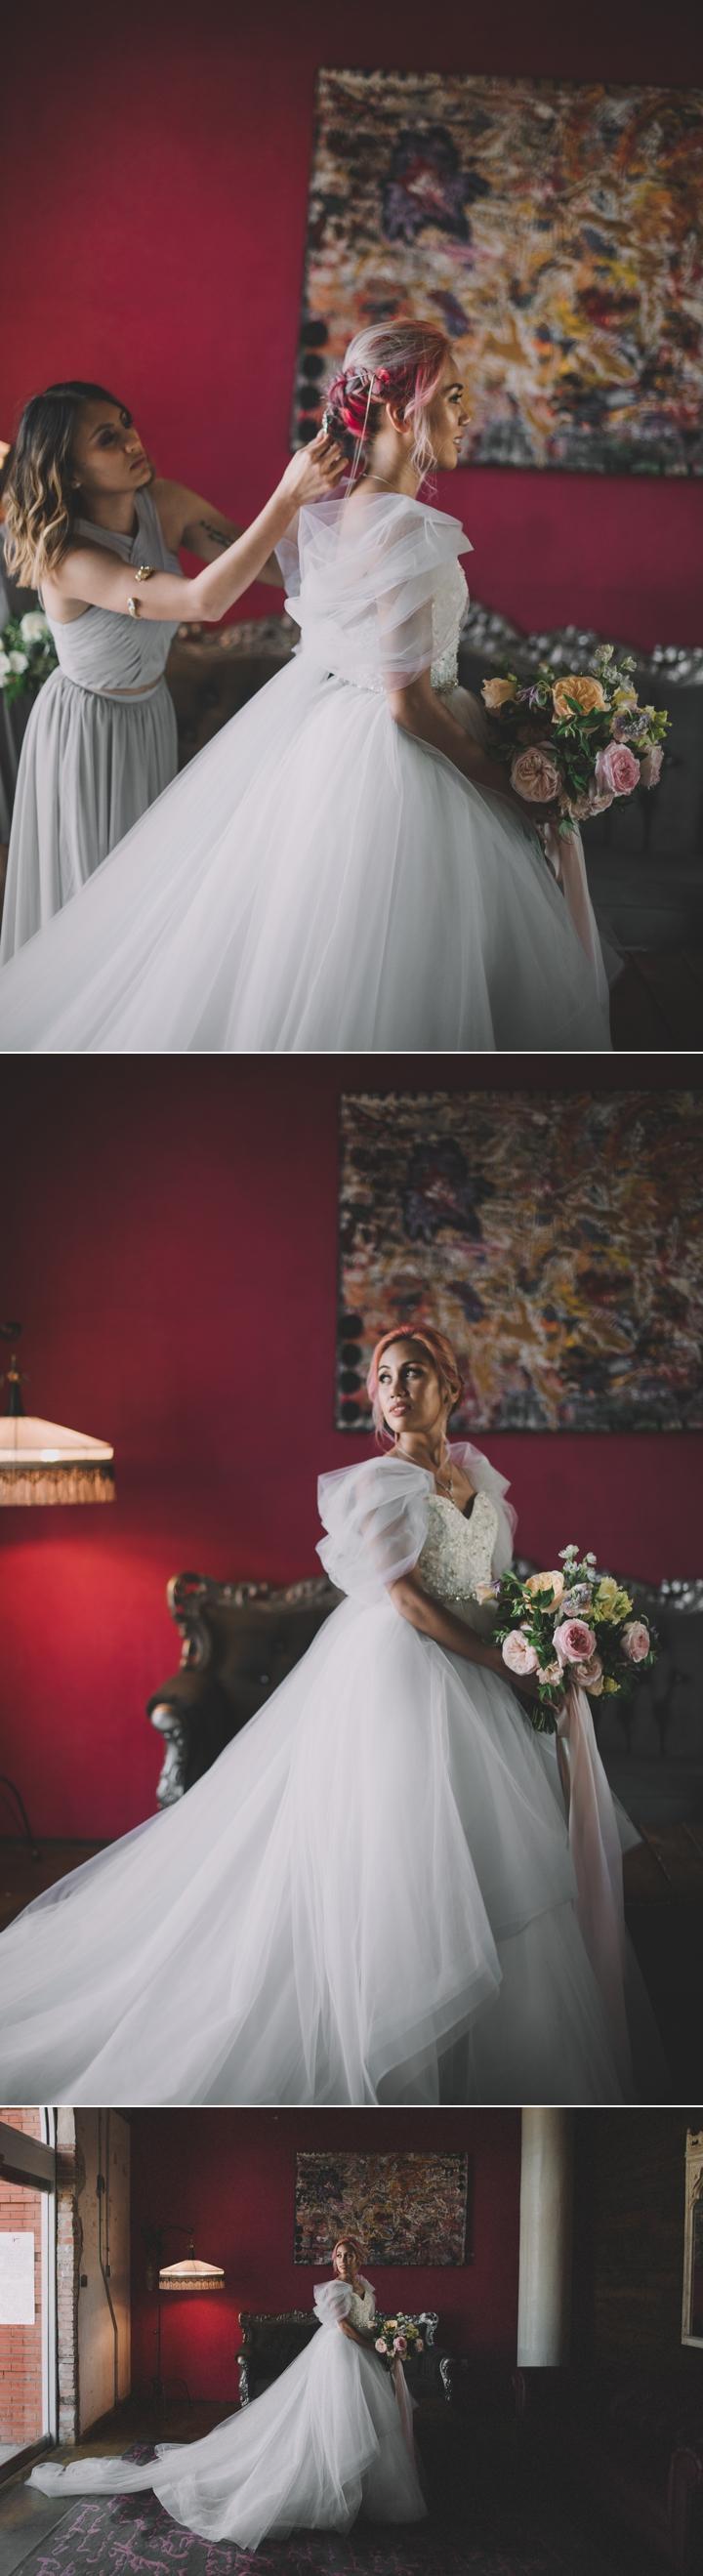 dallas-wedding-photographers-sj2 19.jpg